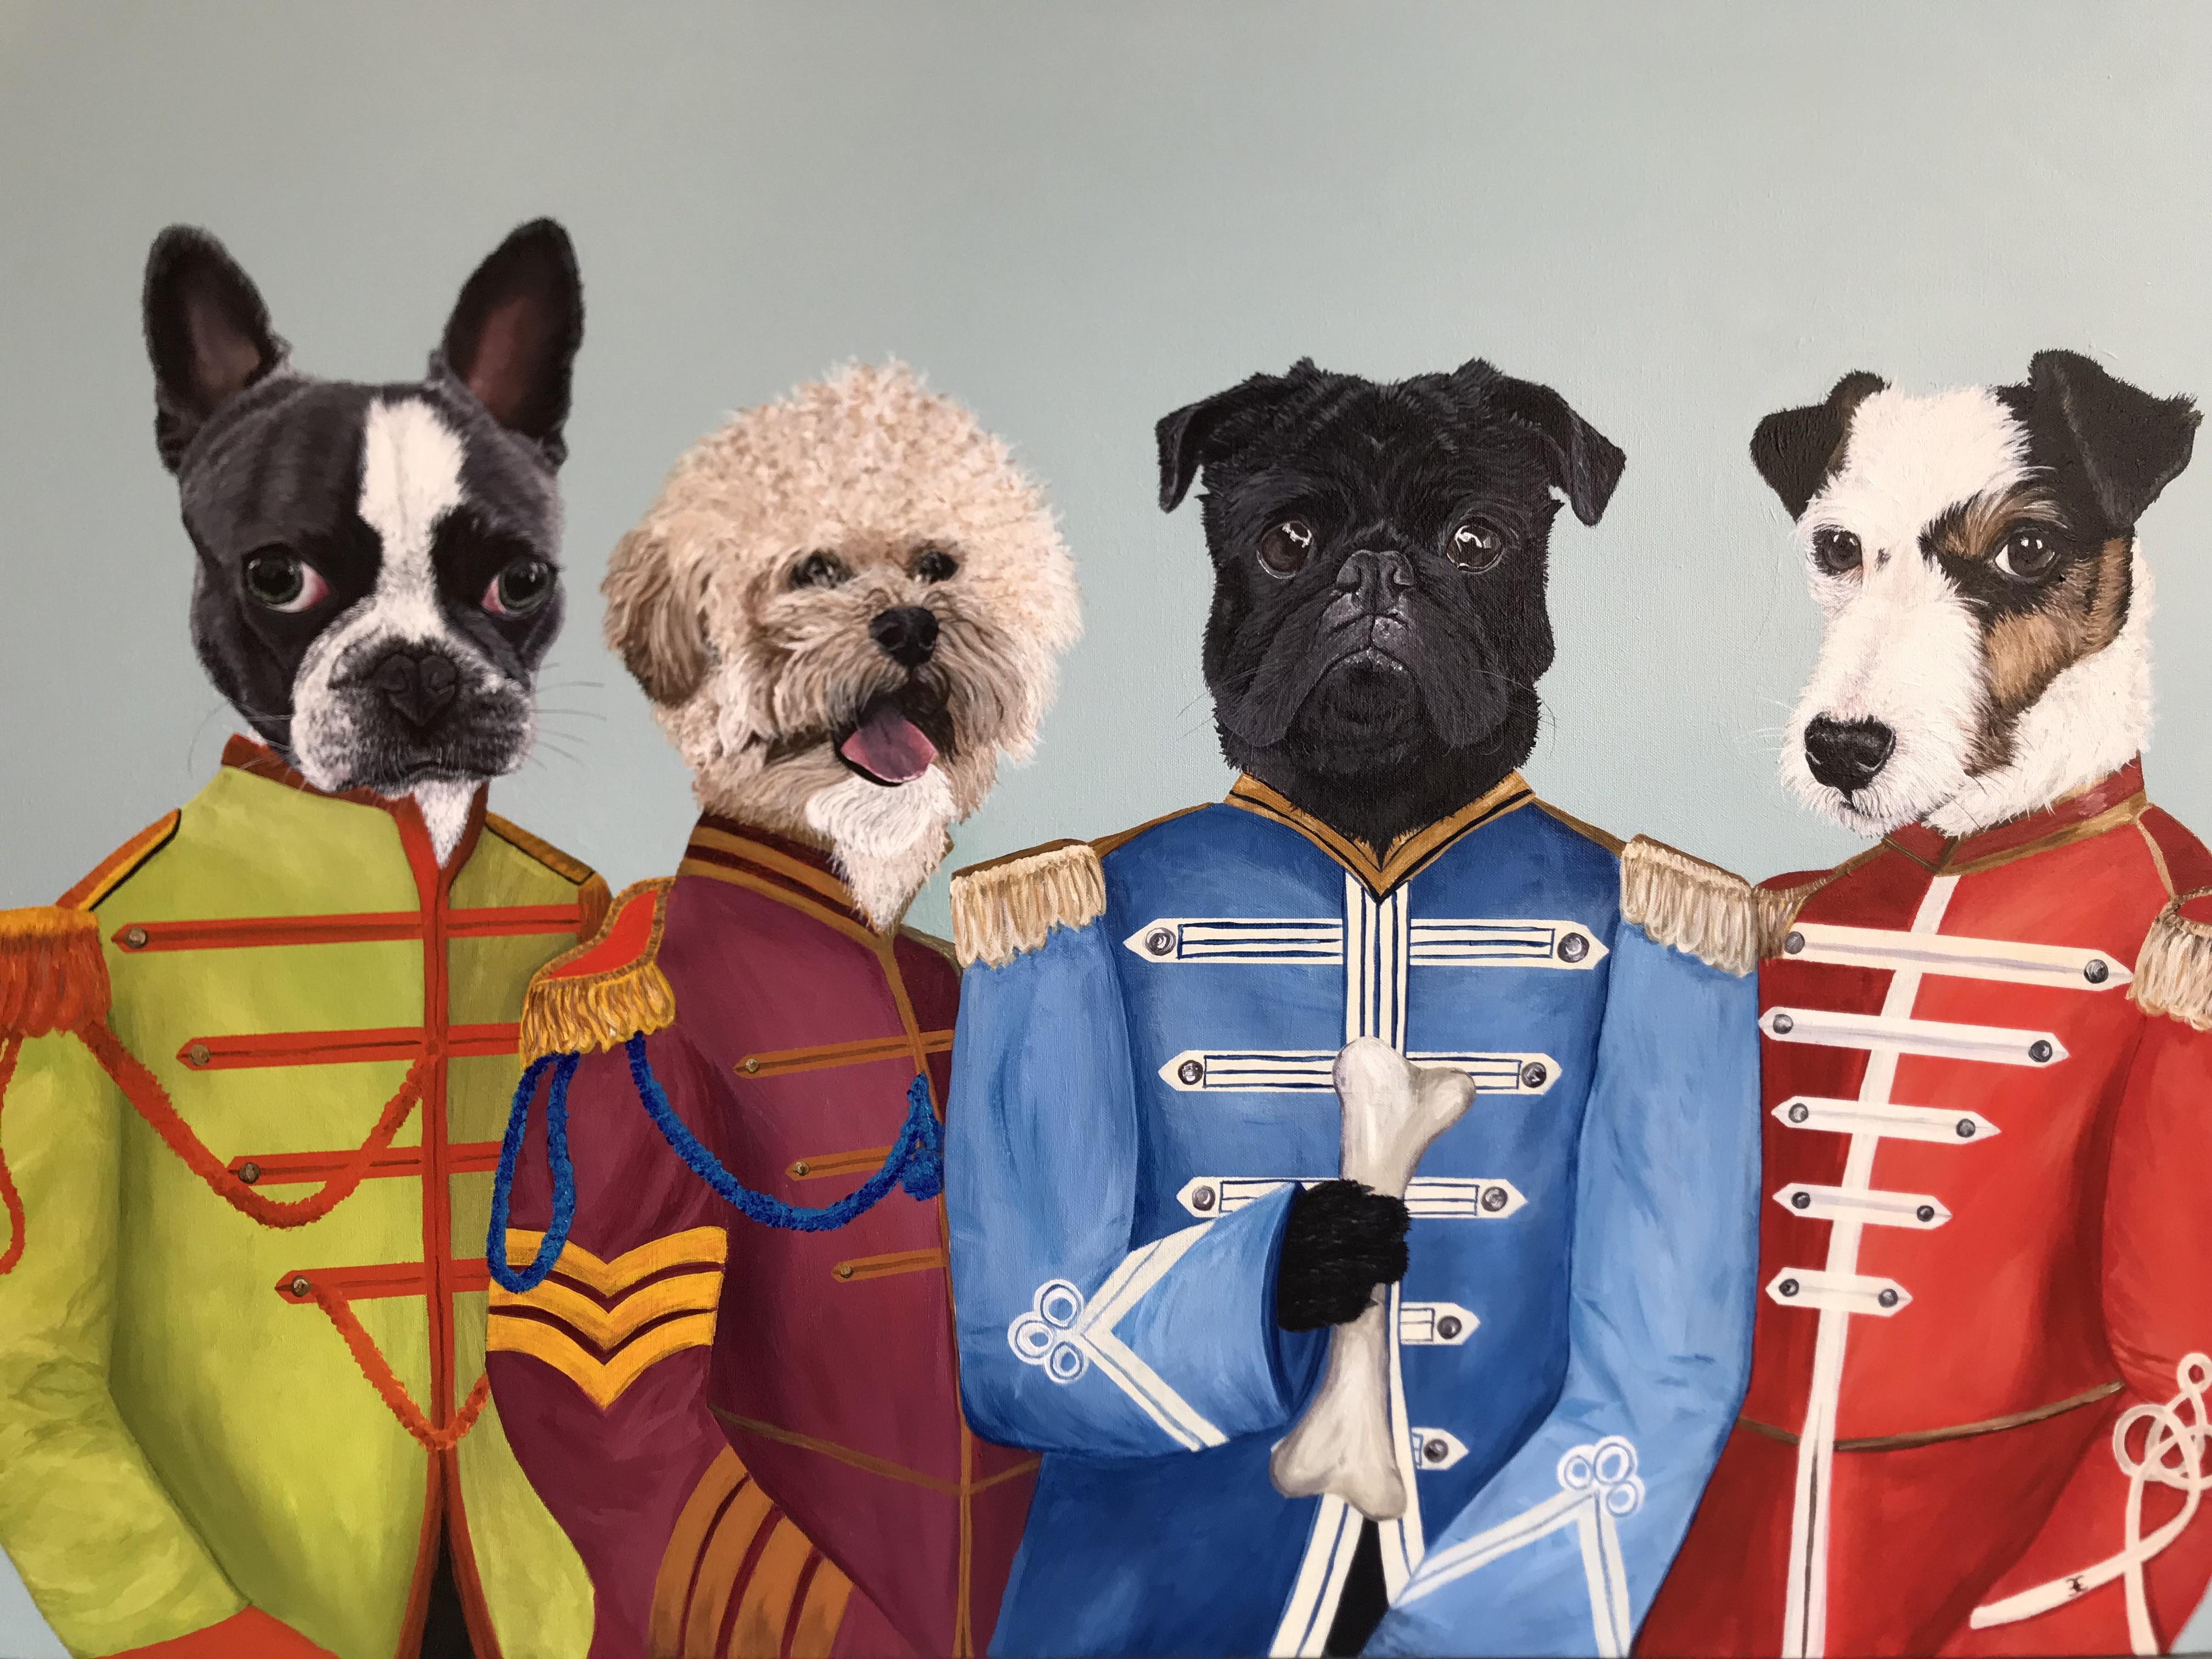 Sargent Dog's